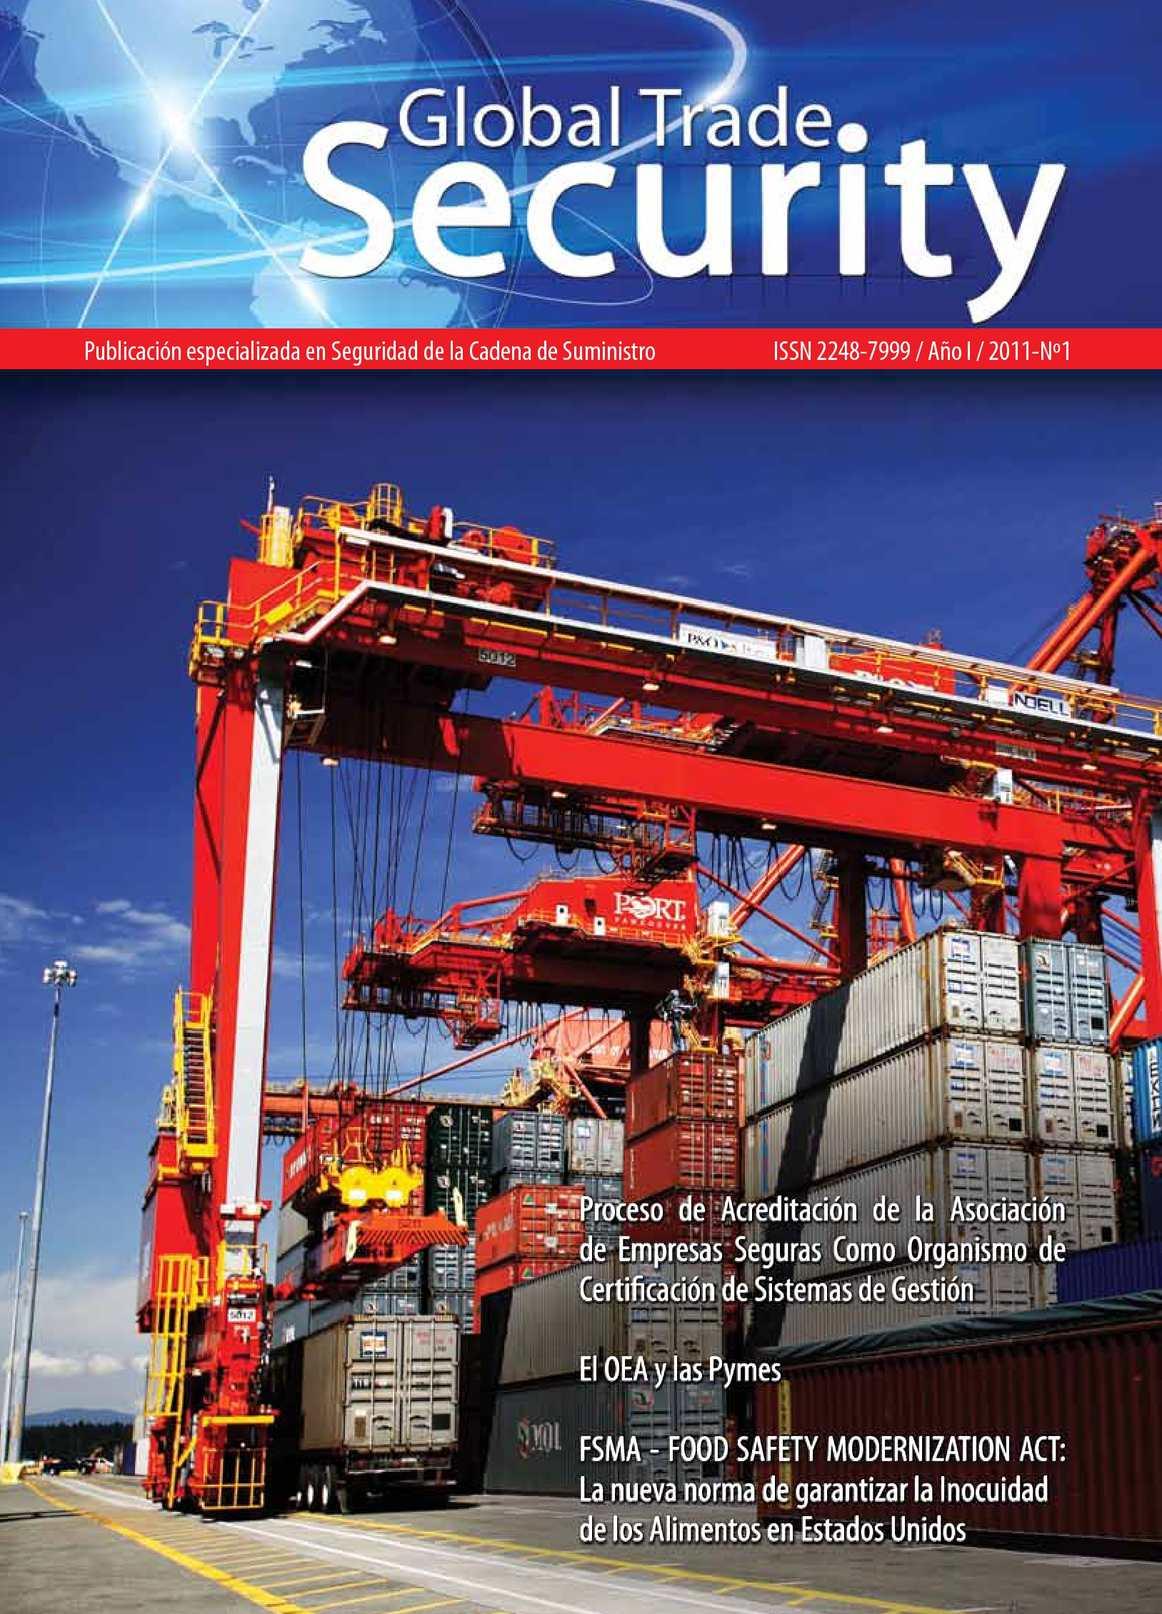 Revista Global Trade Security - Edicion No. 01